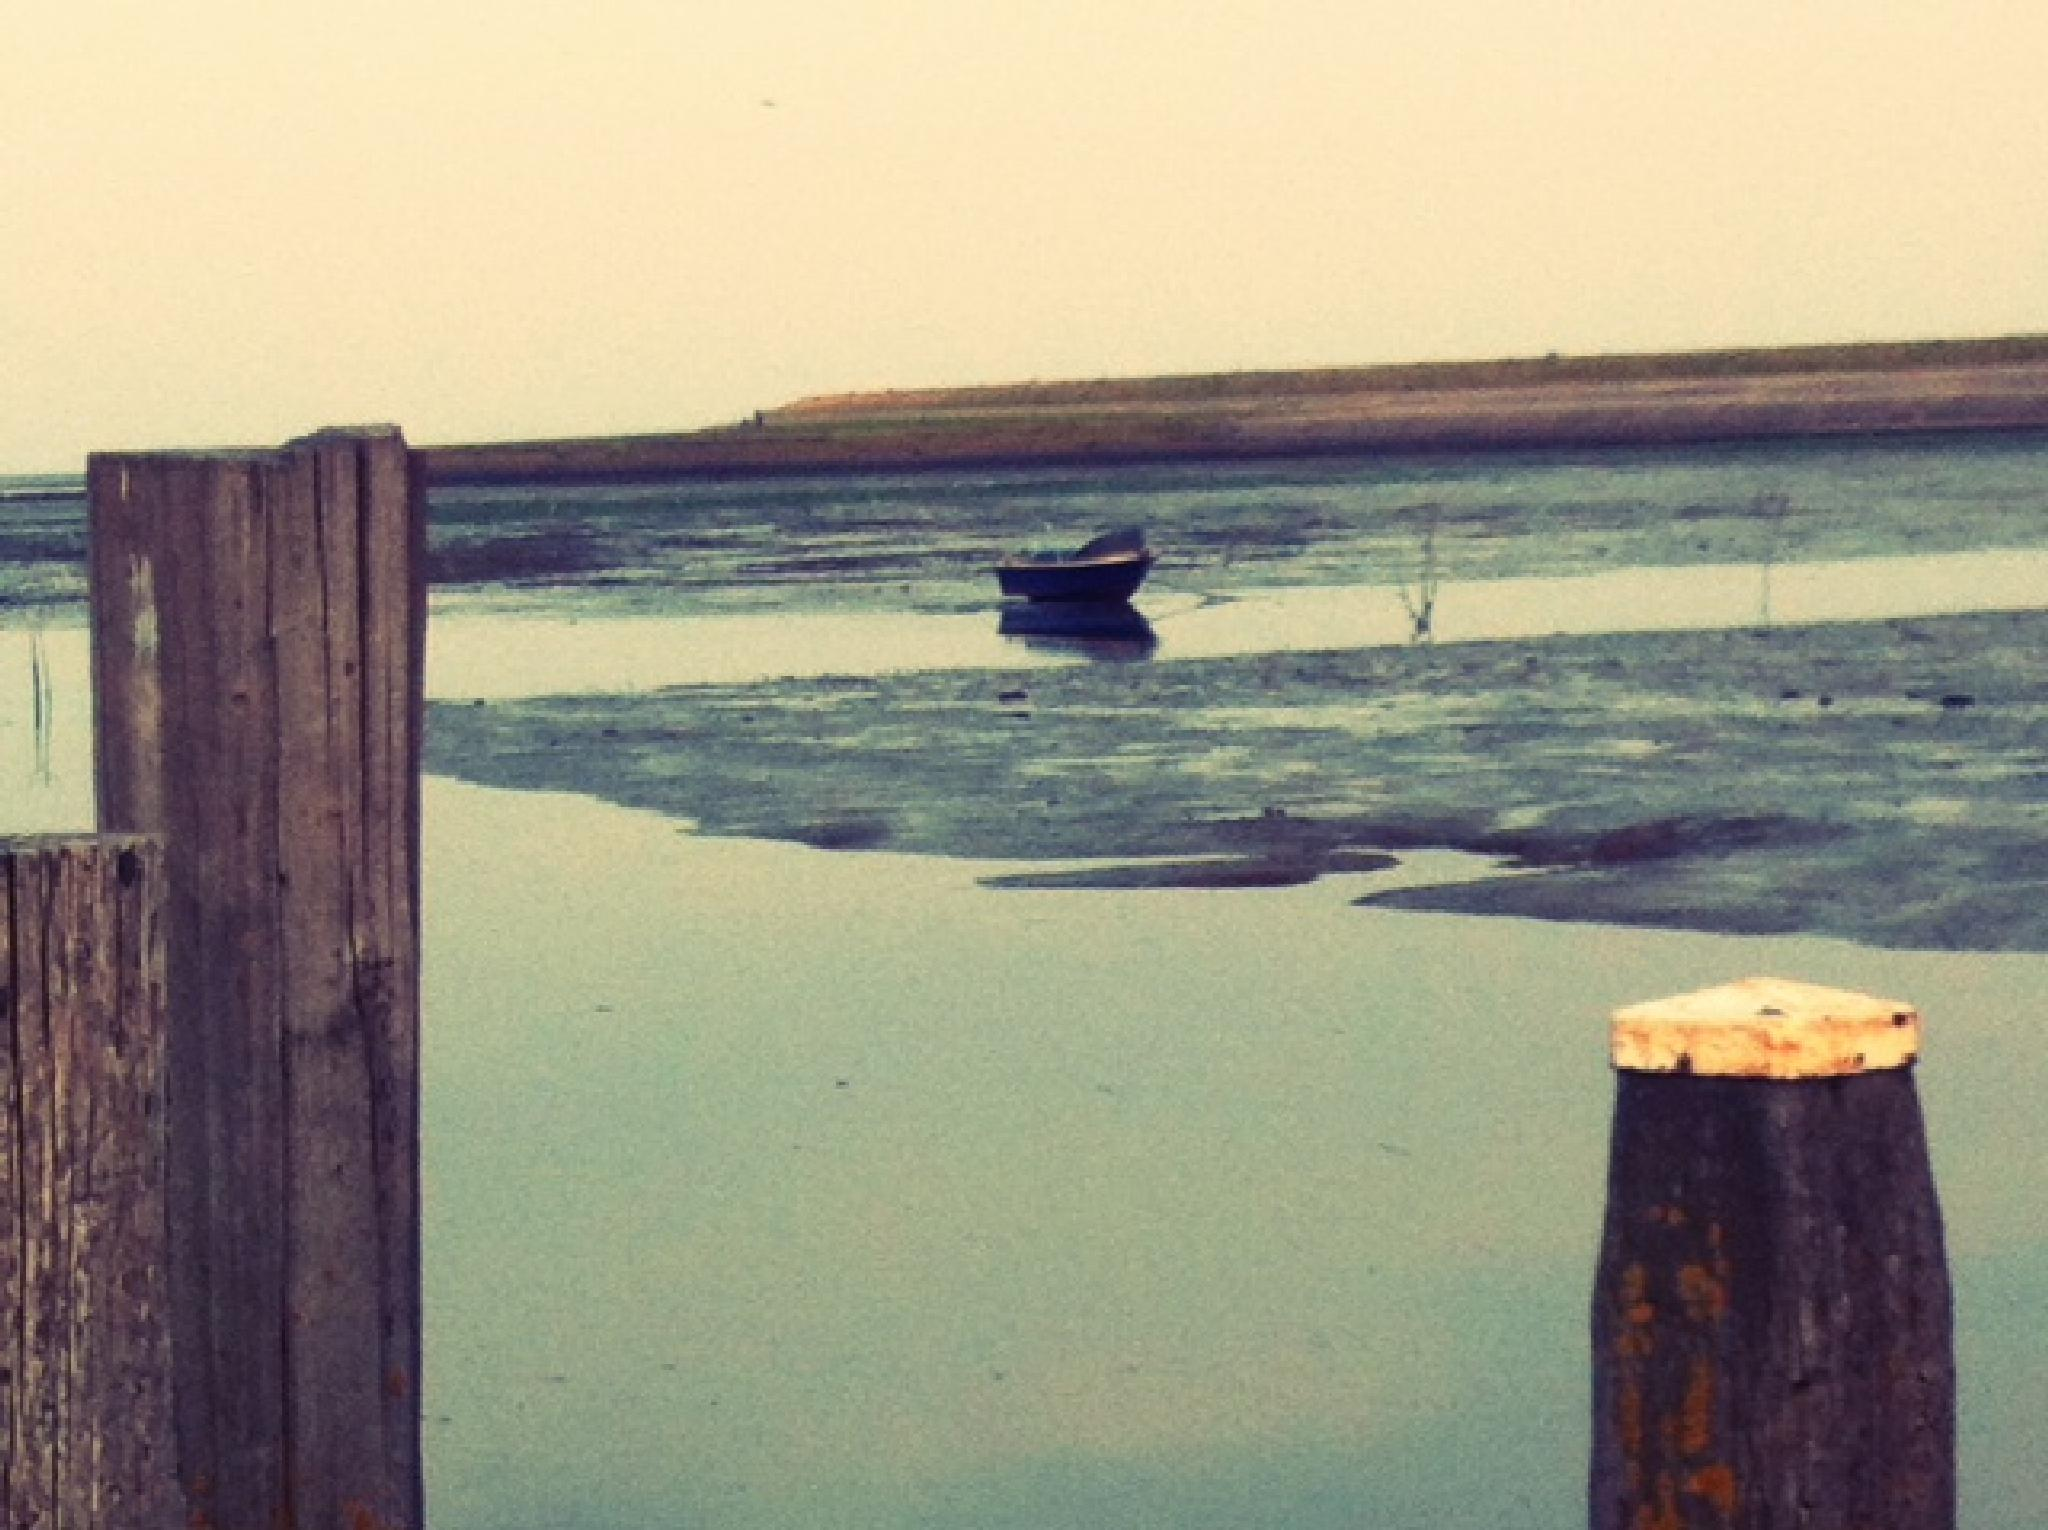 Isle of Texel, Netherlands, by Iphone by patrick vischschraper